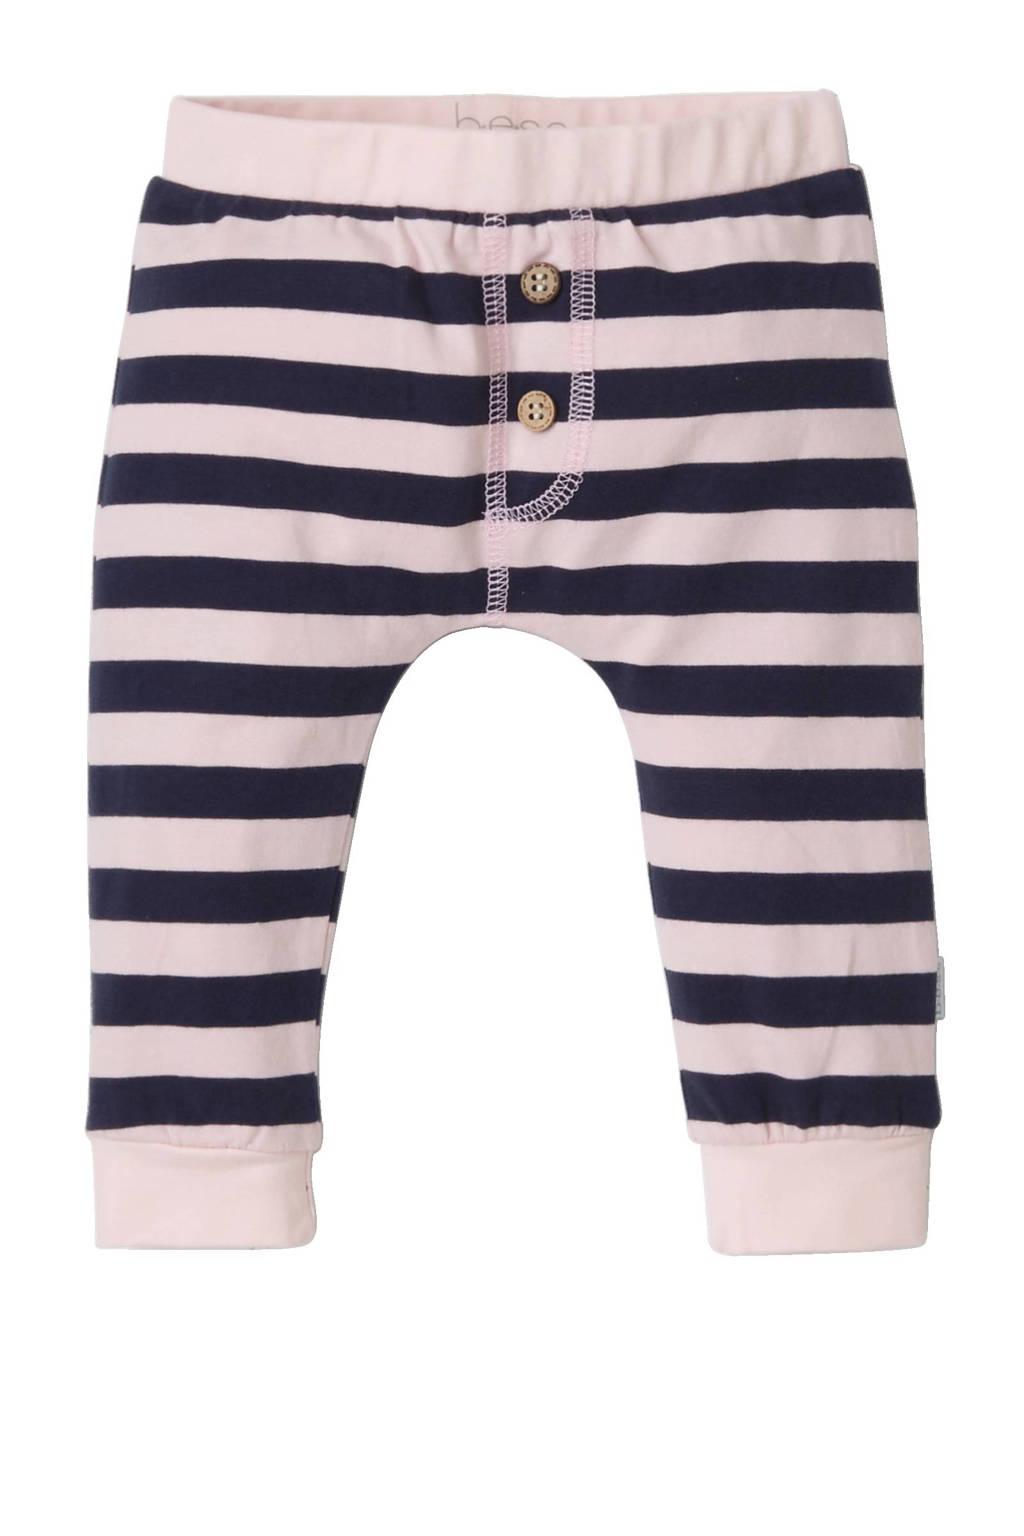 B.E.S.S baby sweatpants, Roze/donkerblauw